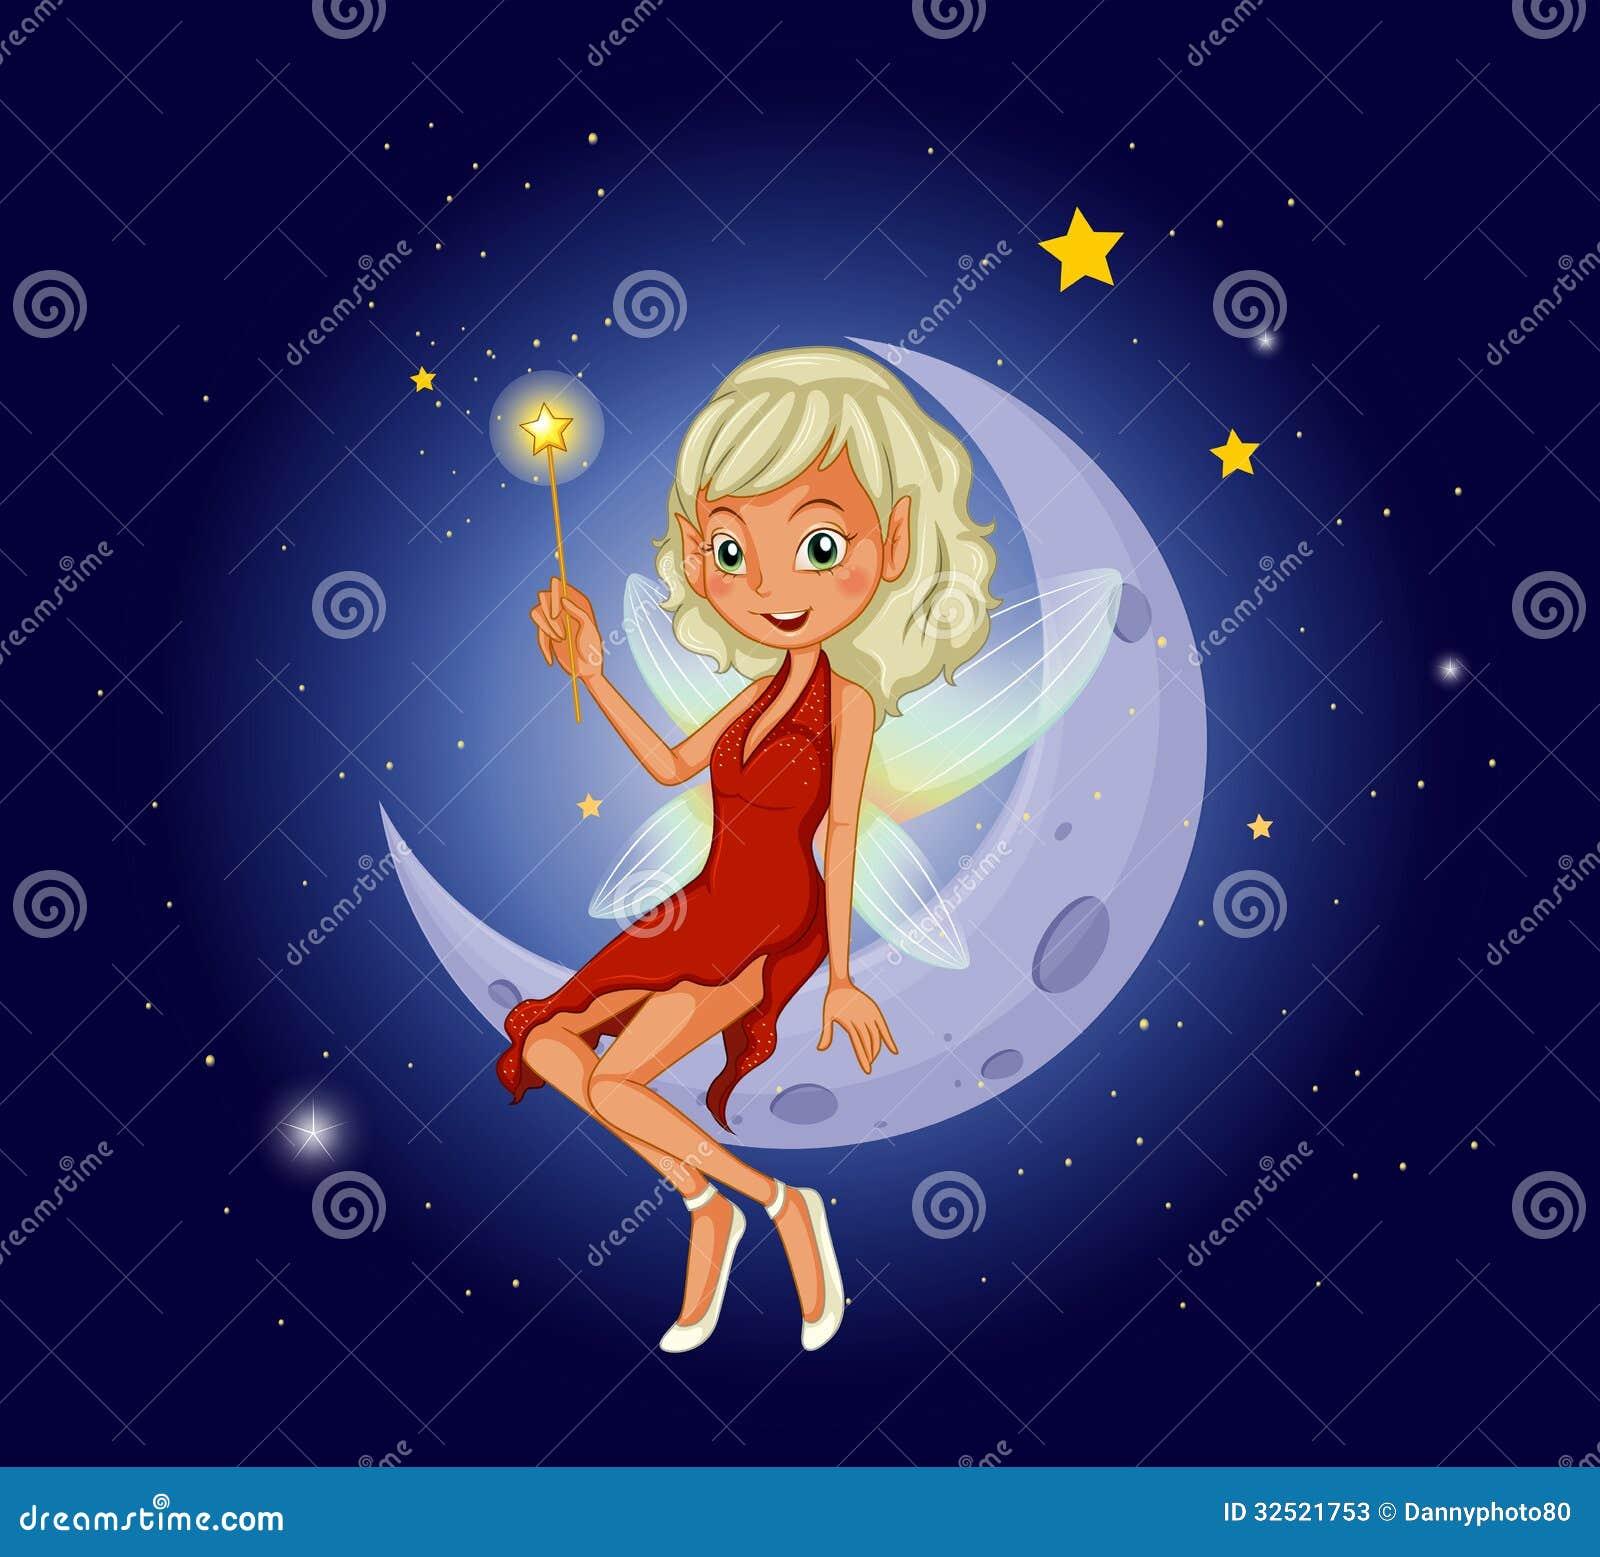 Magic Power Lady Midnight